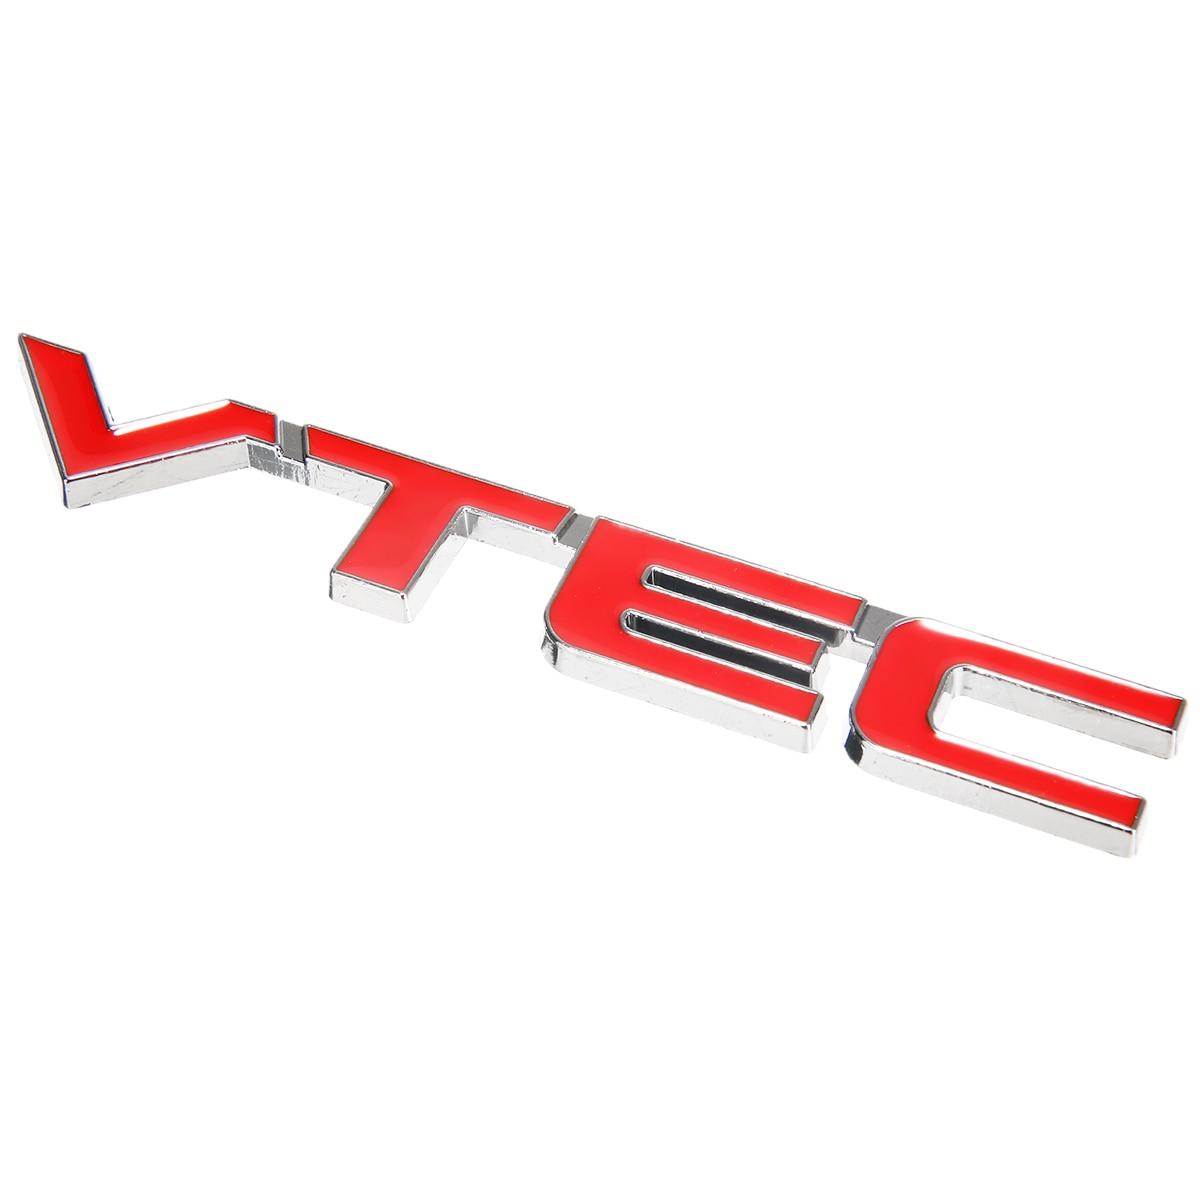 Mayitr 3D VTEC Metal Car Styling Refit Emblem Fender Tail Body Badge Sticker Decal for Honda Civic Accord Odyssey Spirior CRV